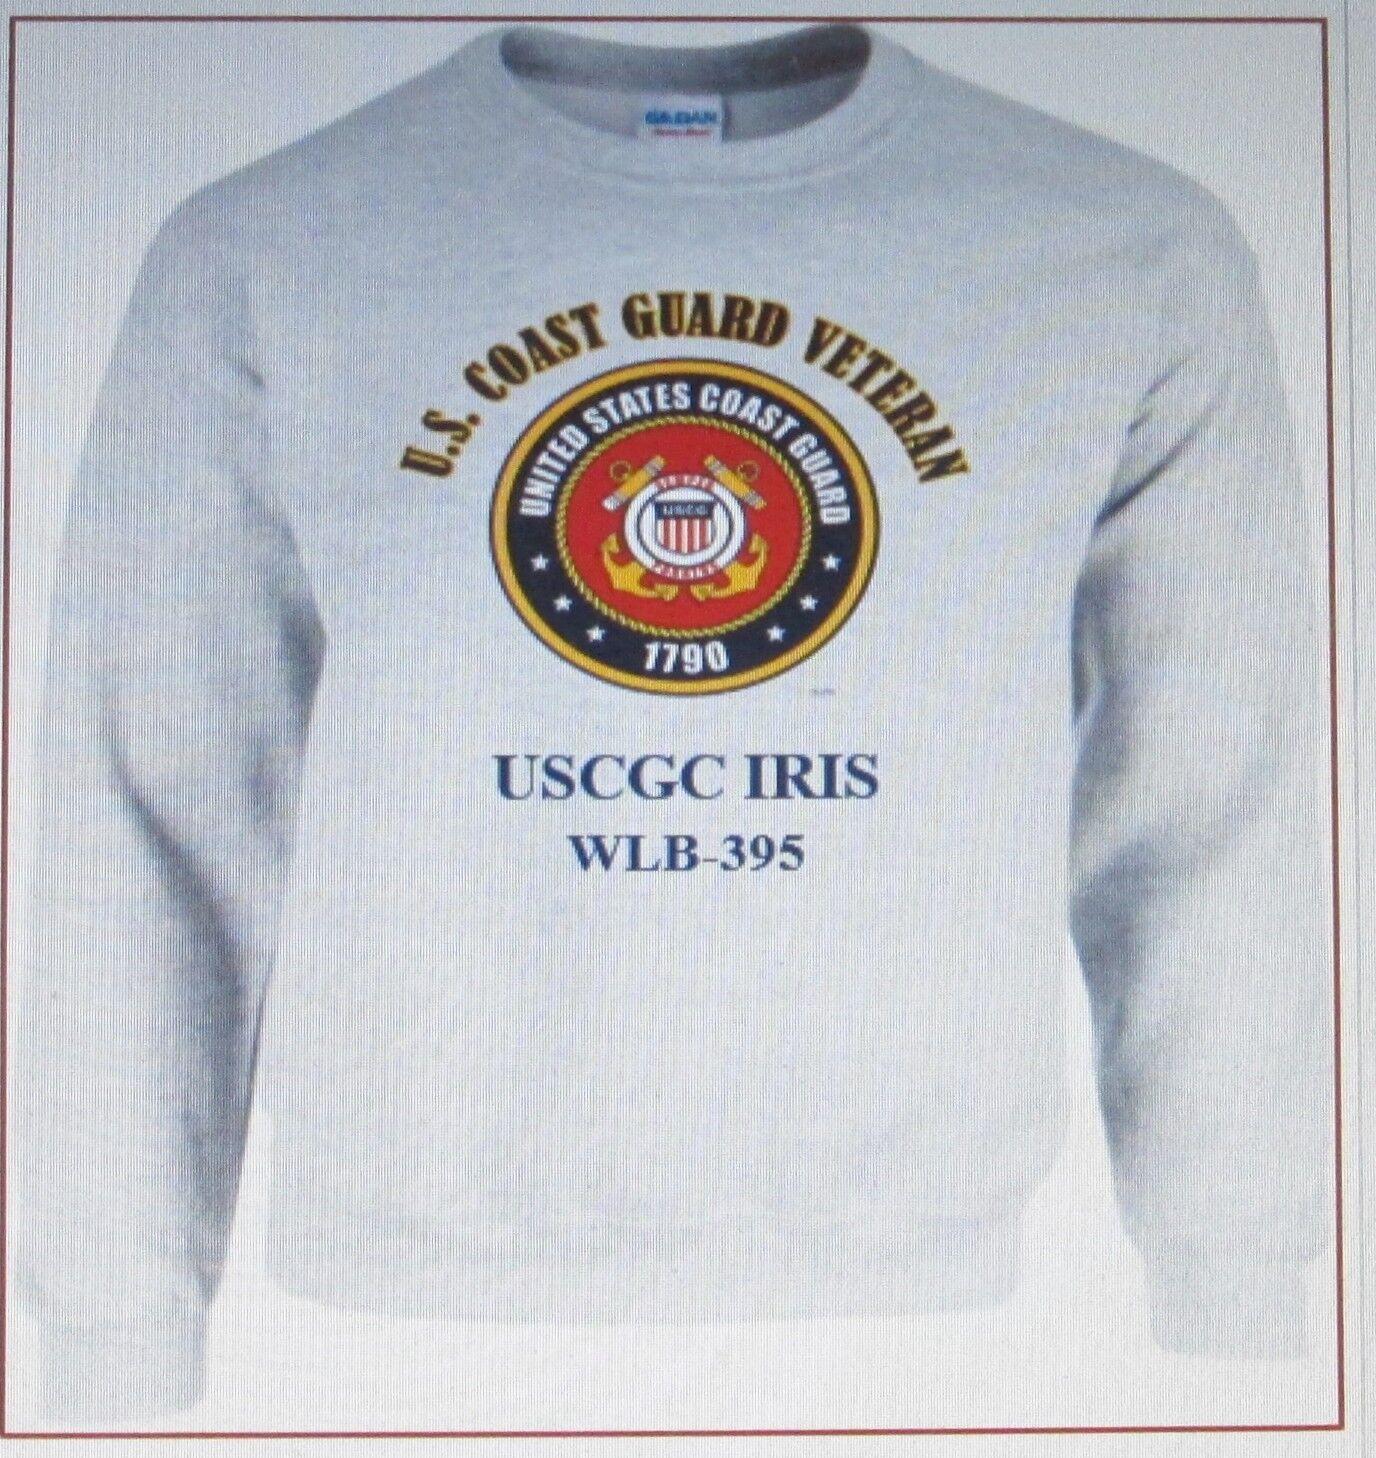 USCGC IRIS  WLB-395  COAST GUARD VETERAN SWEATSHIRT